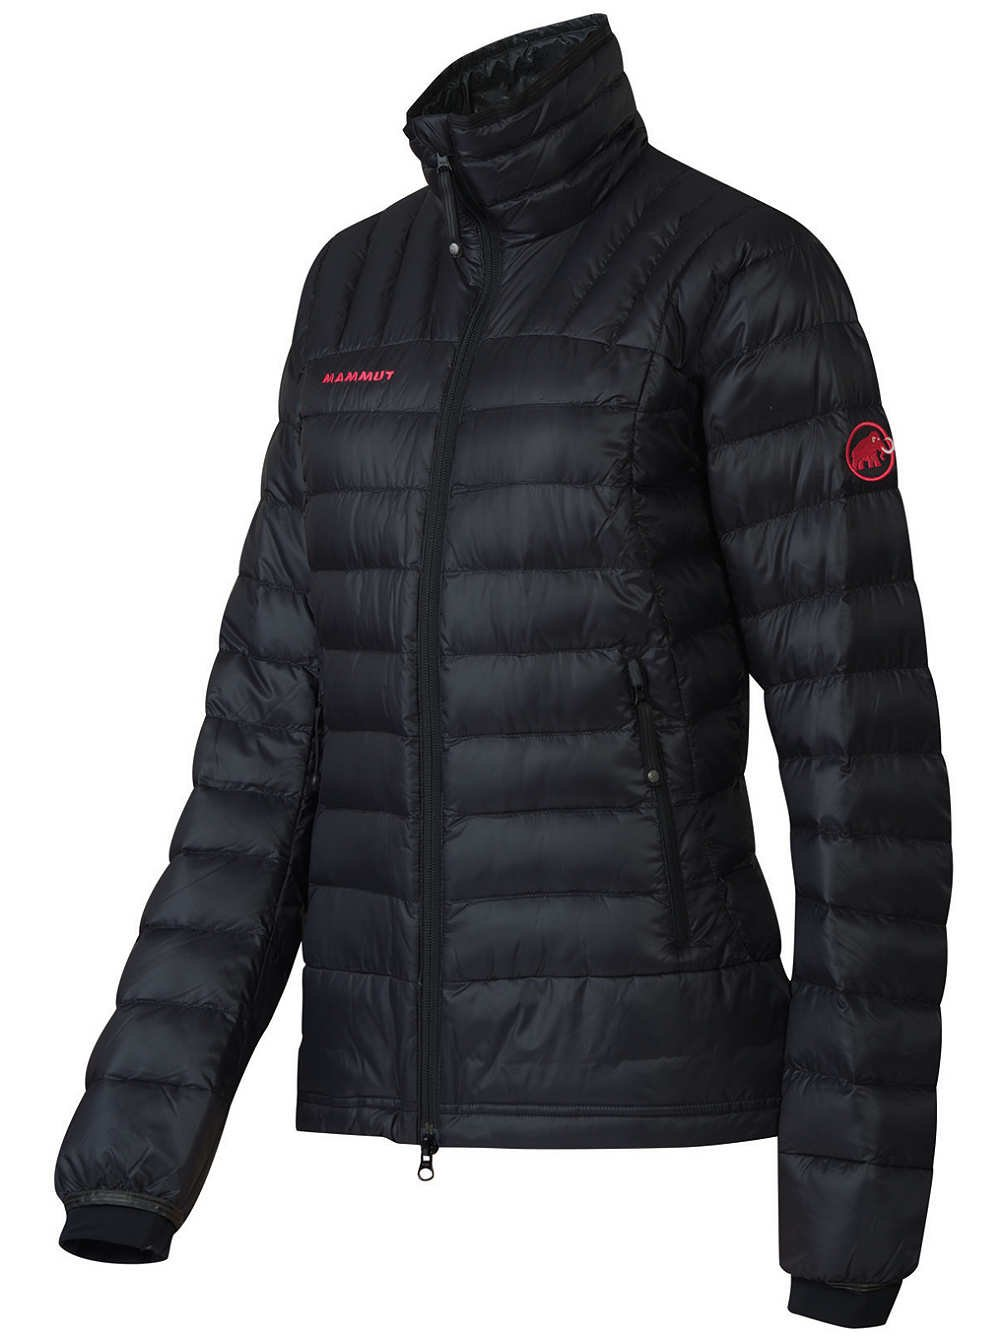 Mammut Kira IS Jacket Women – Daunenjacke günstig online kaufen